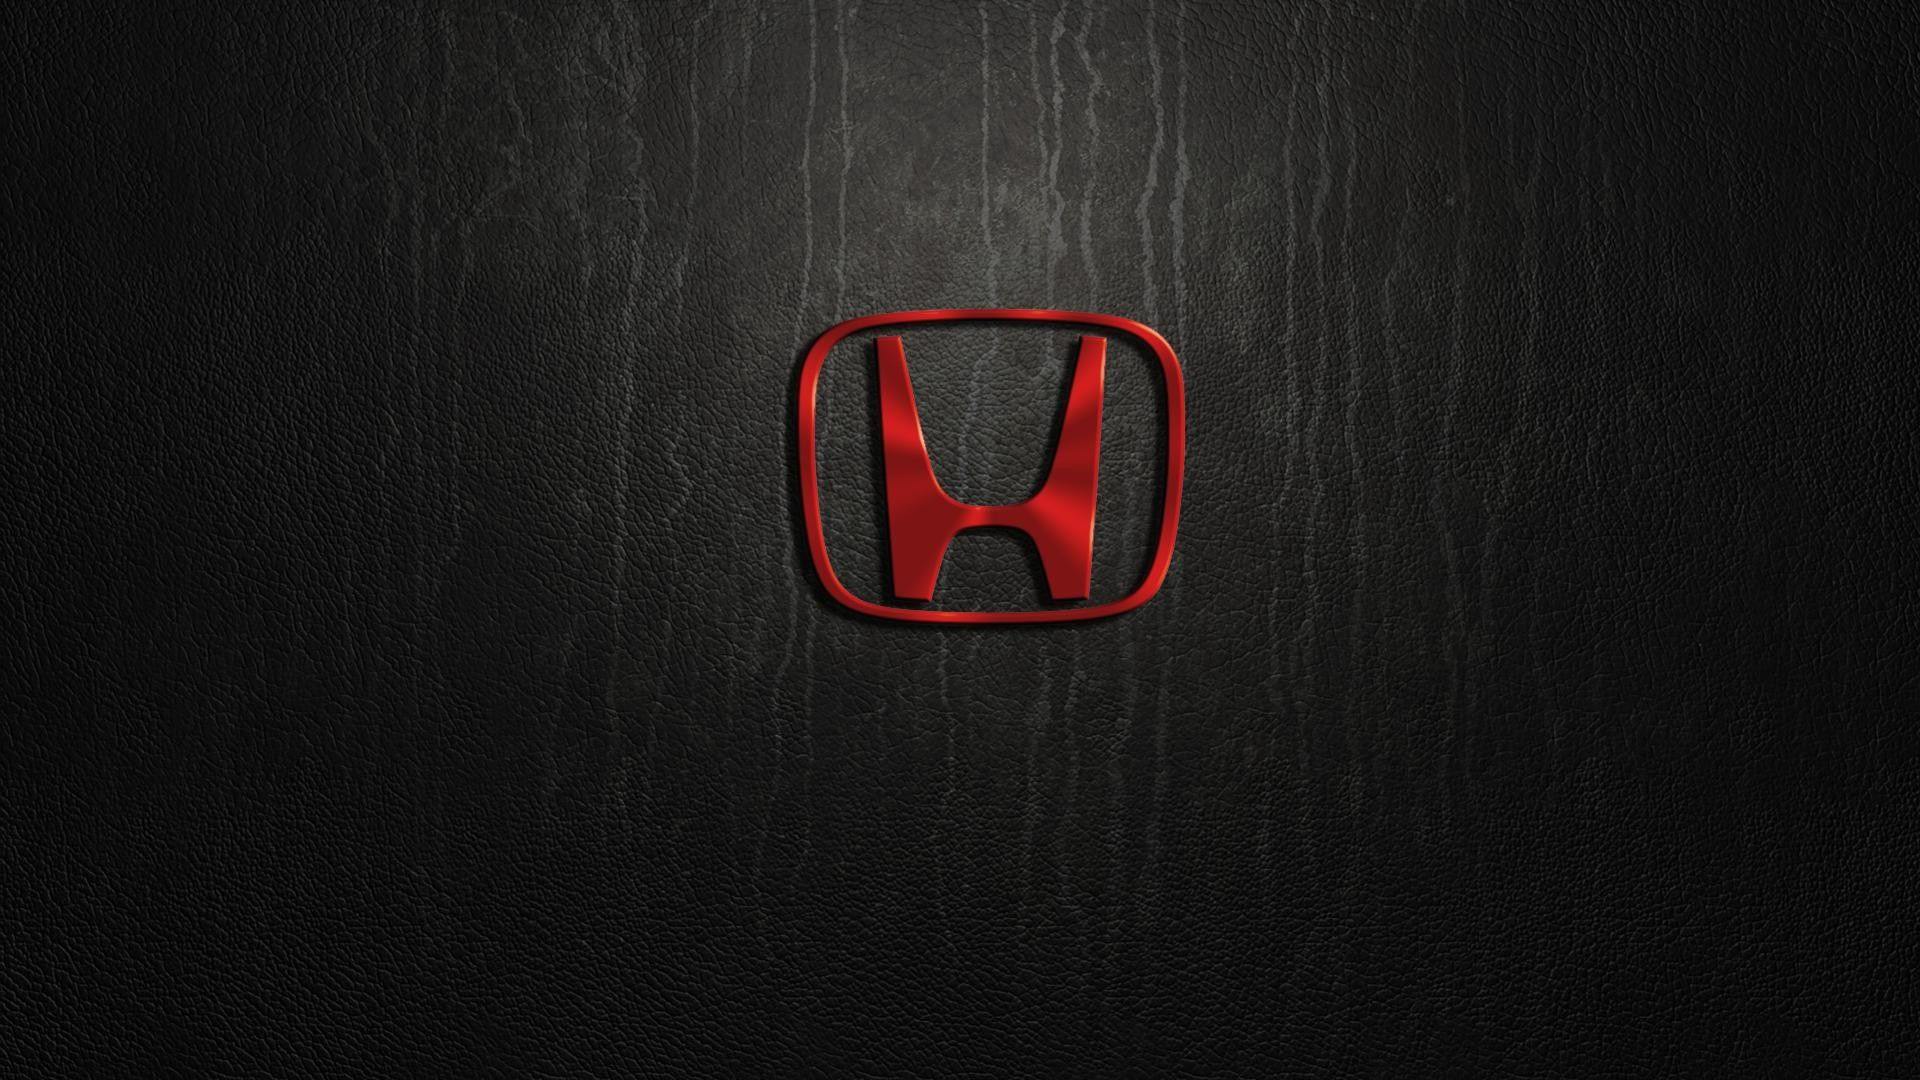 1920x1080 Honda Wallpaper Logo Cars Wallpapers Hd Wallpapers Hd